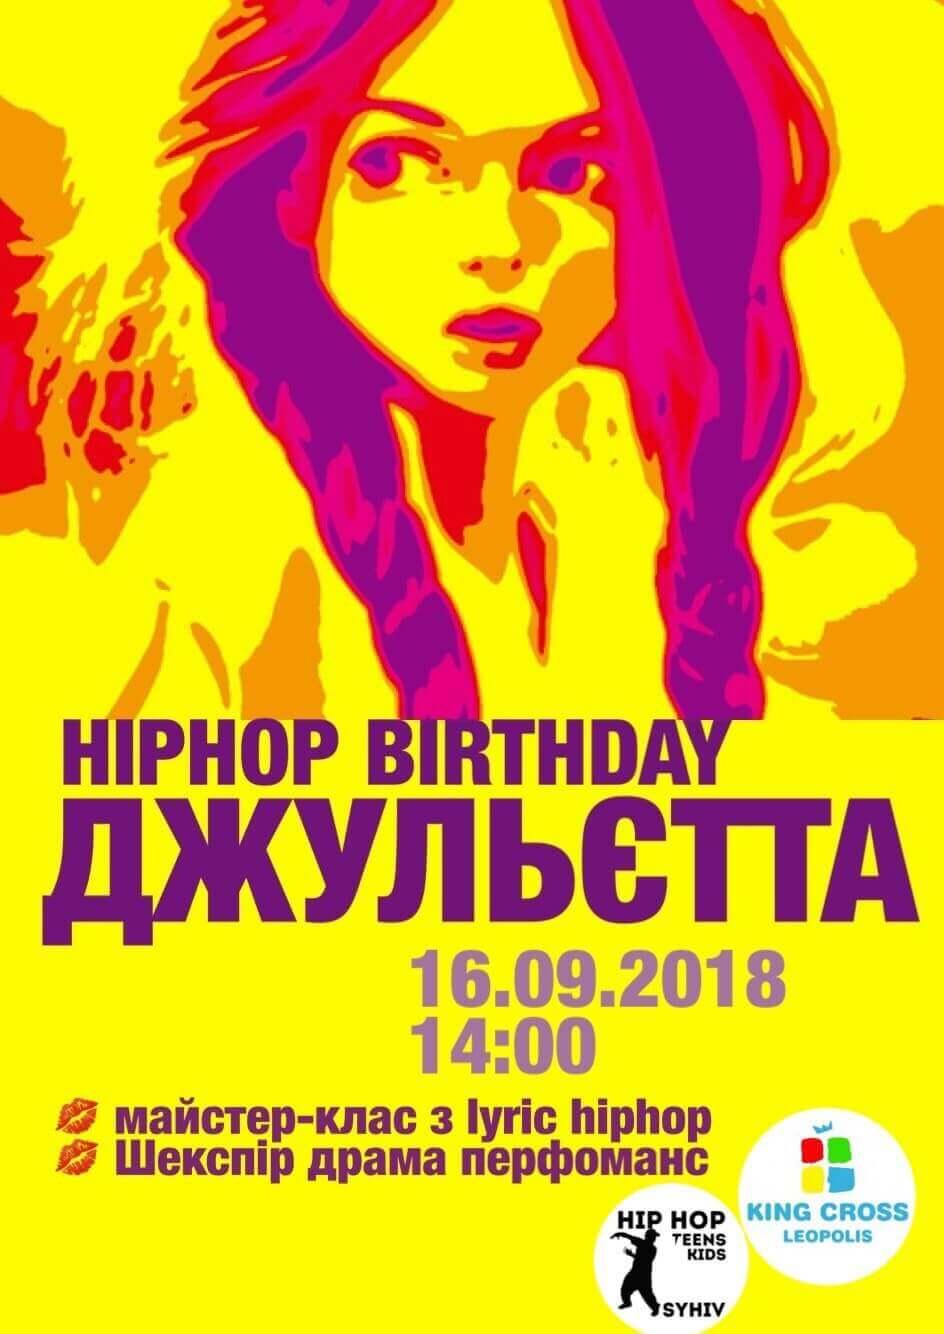 Hiphop Birthday ДЖУЛЬЄТА